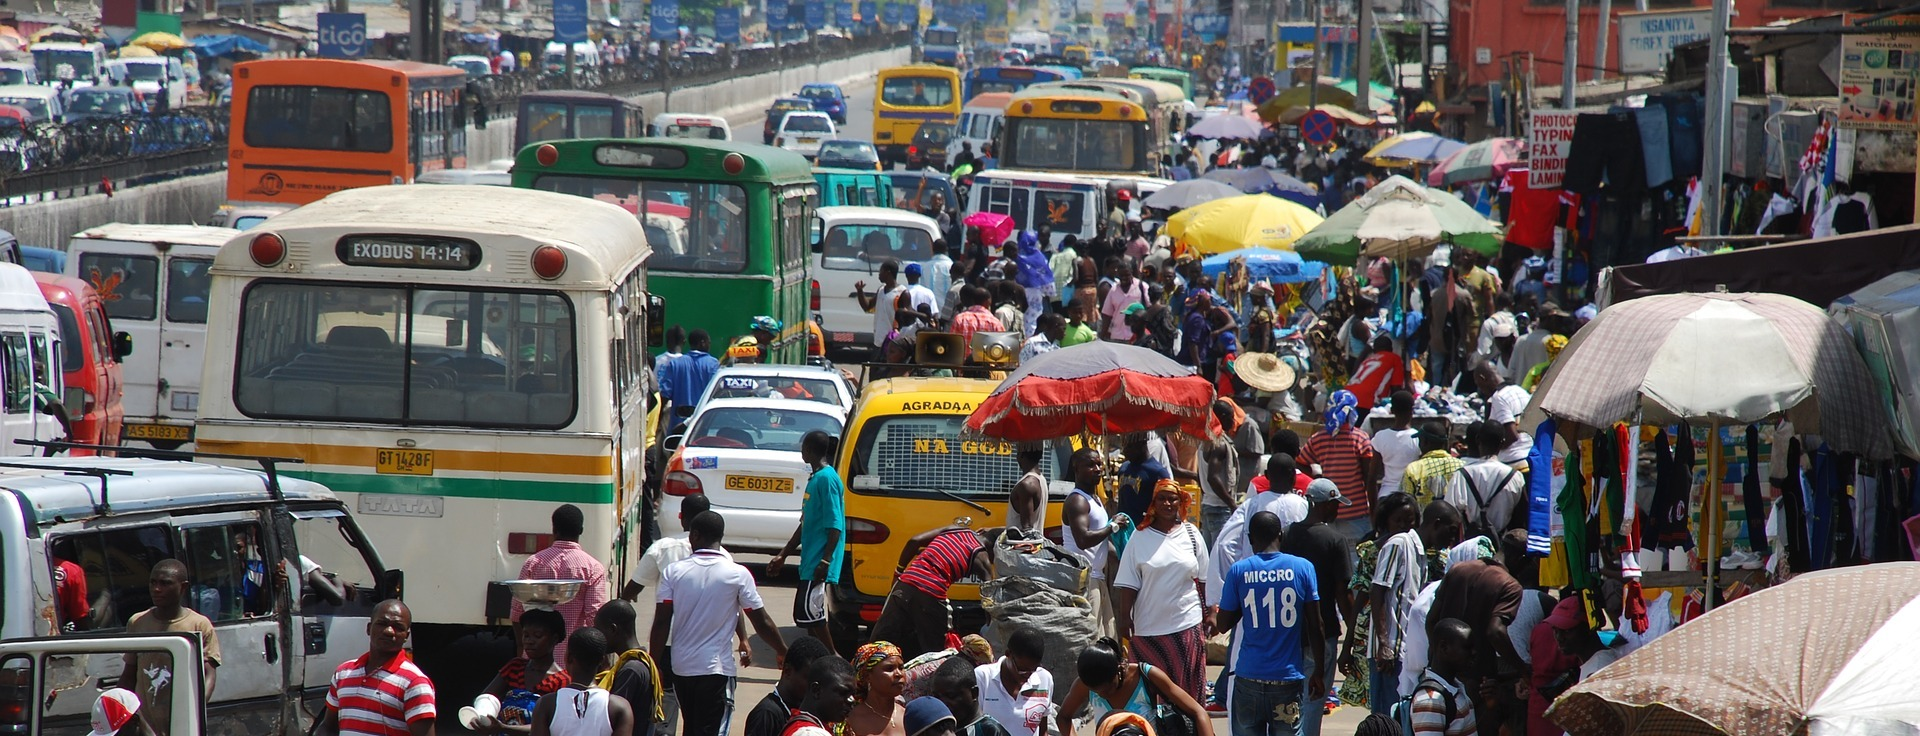 Autotransport Afrika Fahrzeugtransport